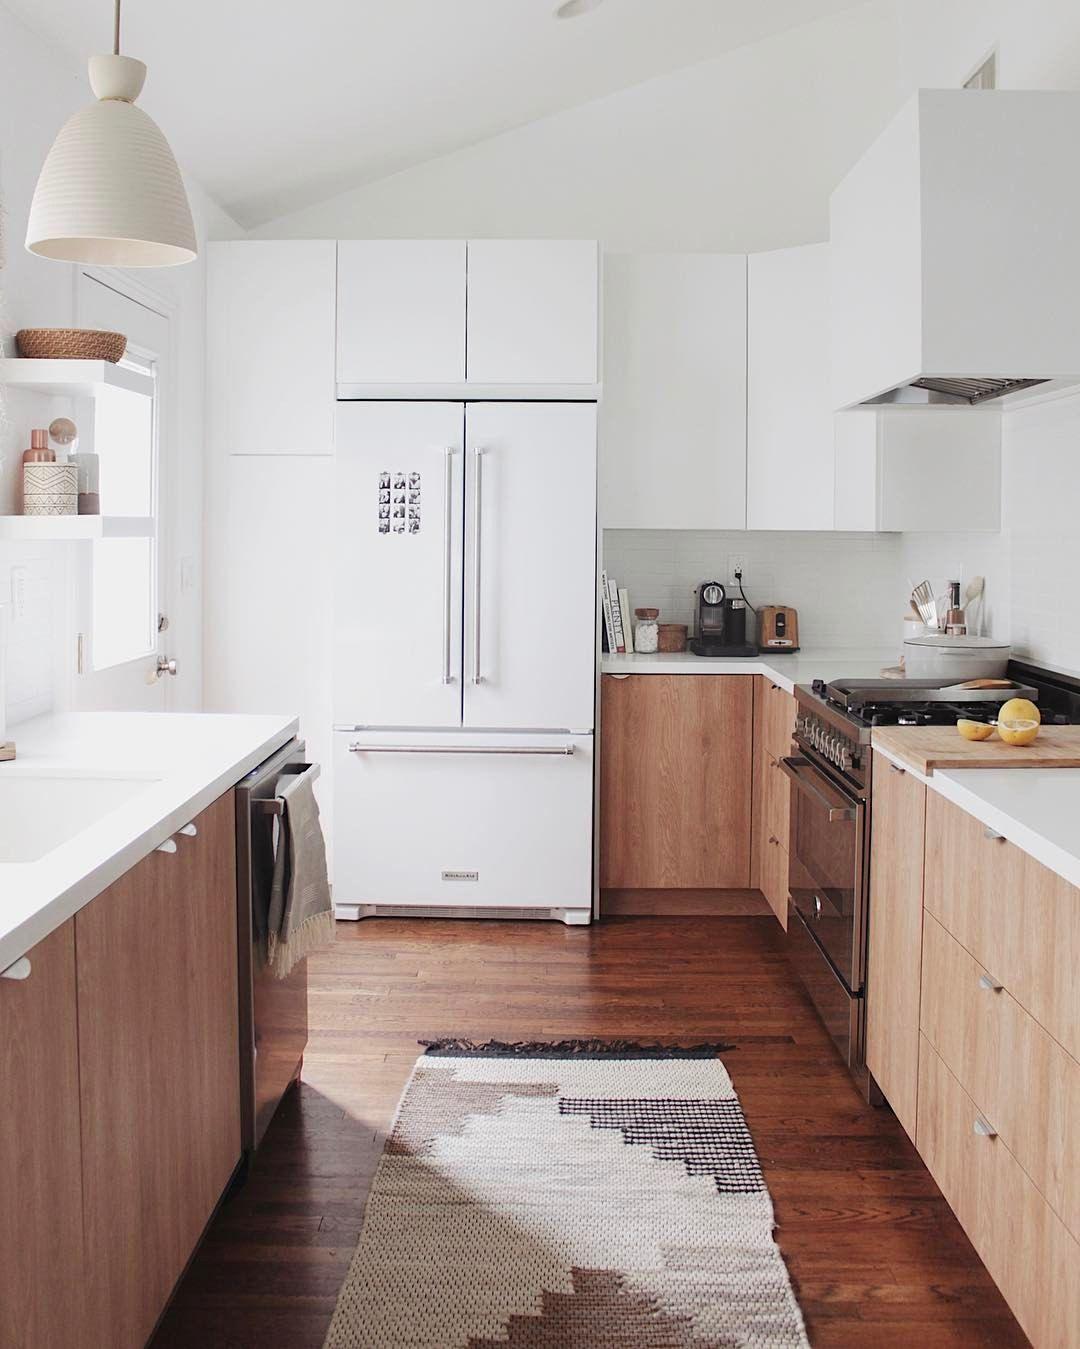 jaren 60 stijl minimalistische decoratie minimalistische slaapkamer minimalistisch interieur minimalistisch design